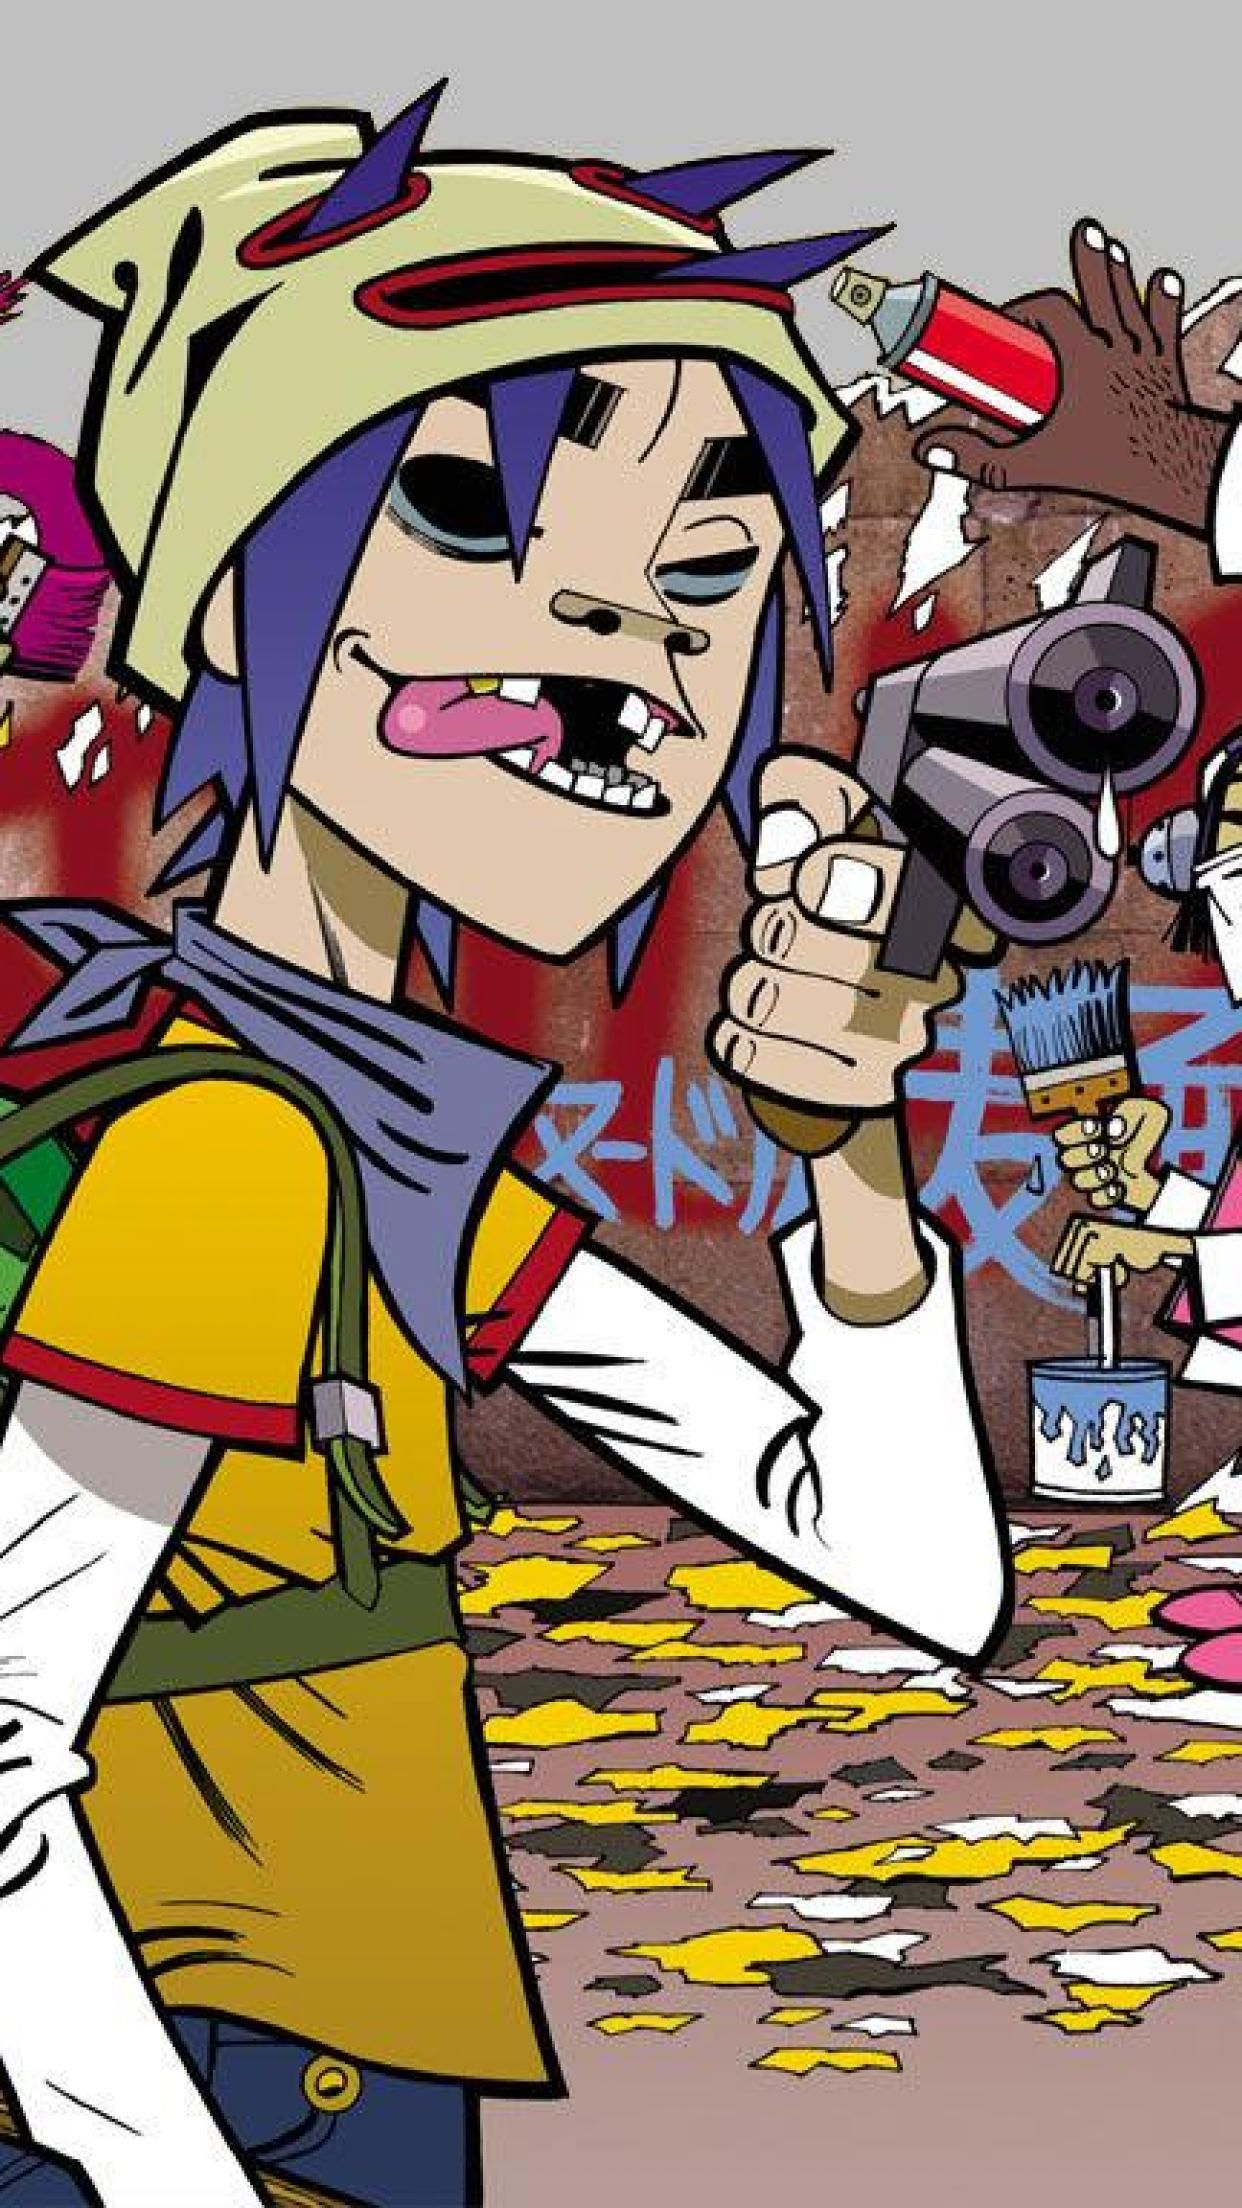 Hd Graffiti Wallpapers On Wallpaperdog